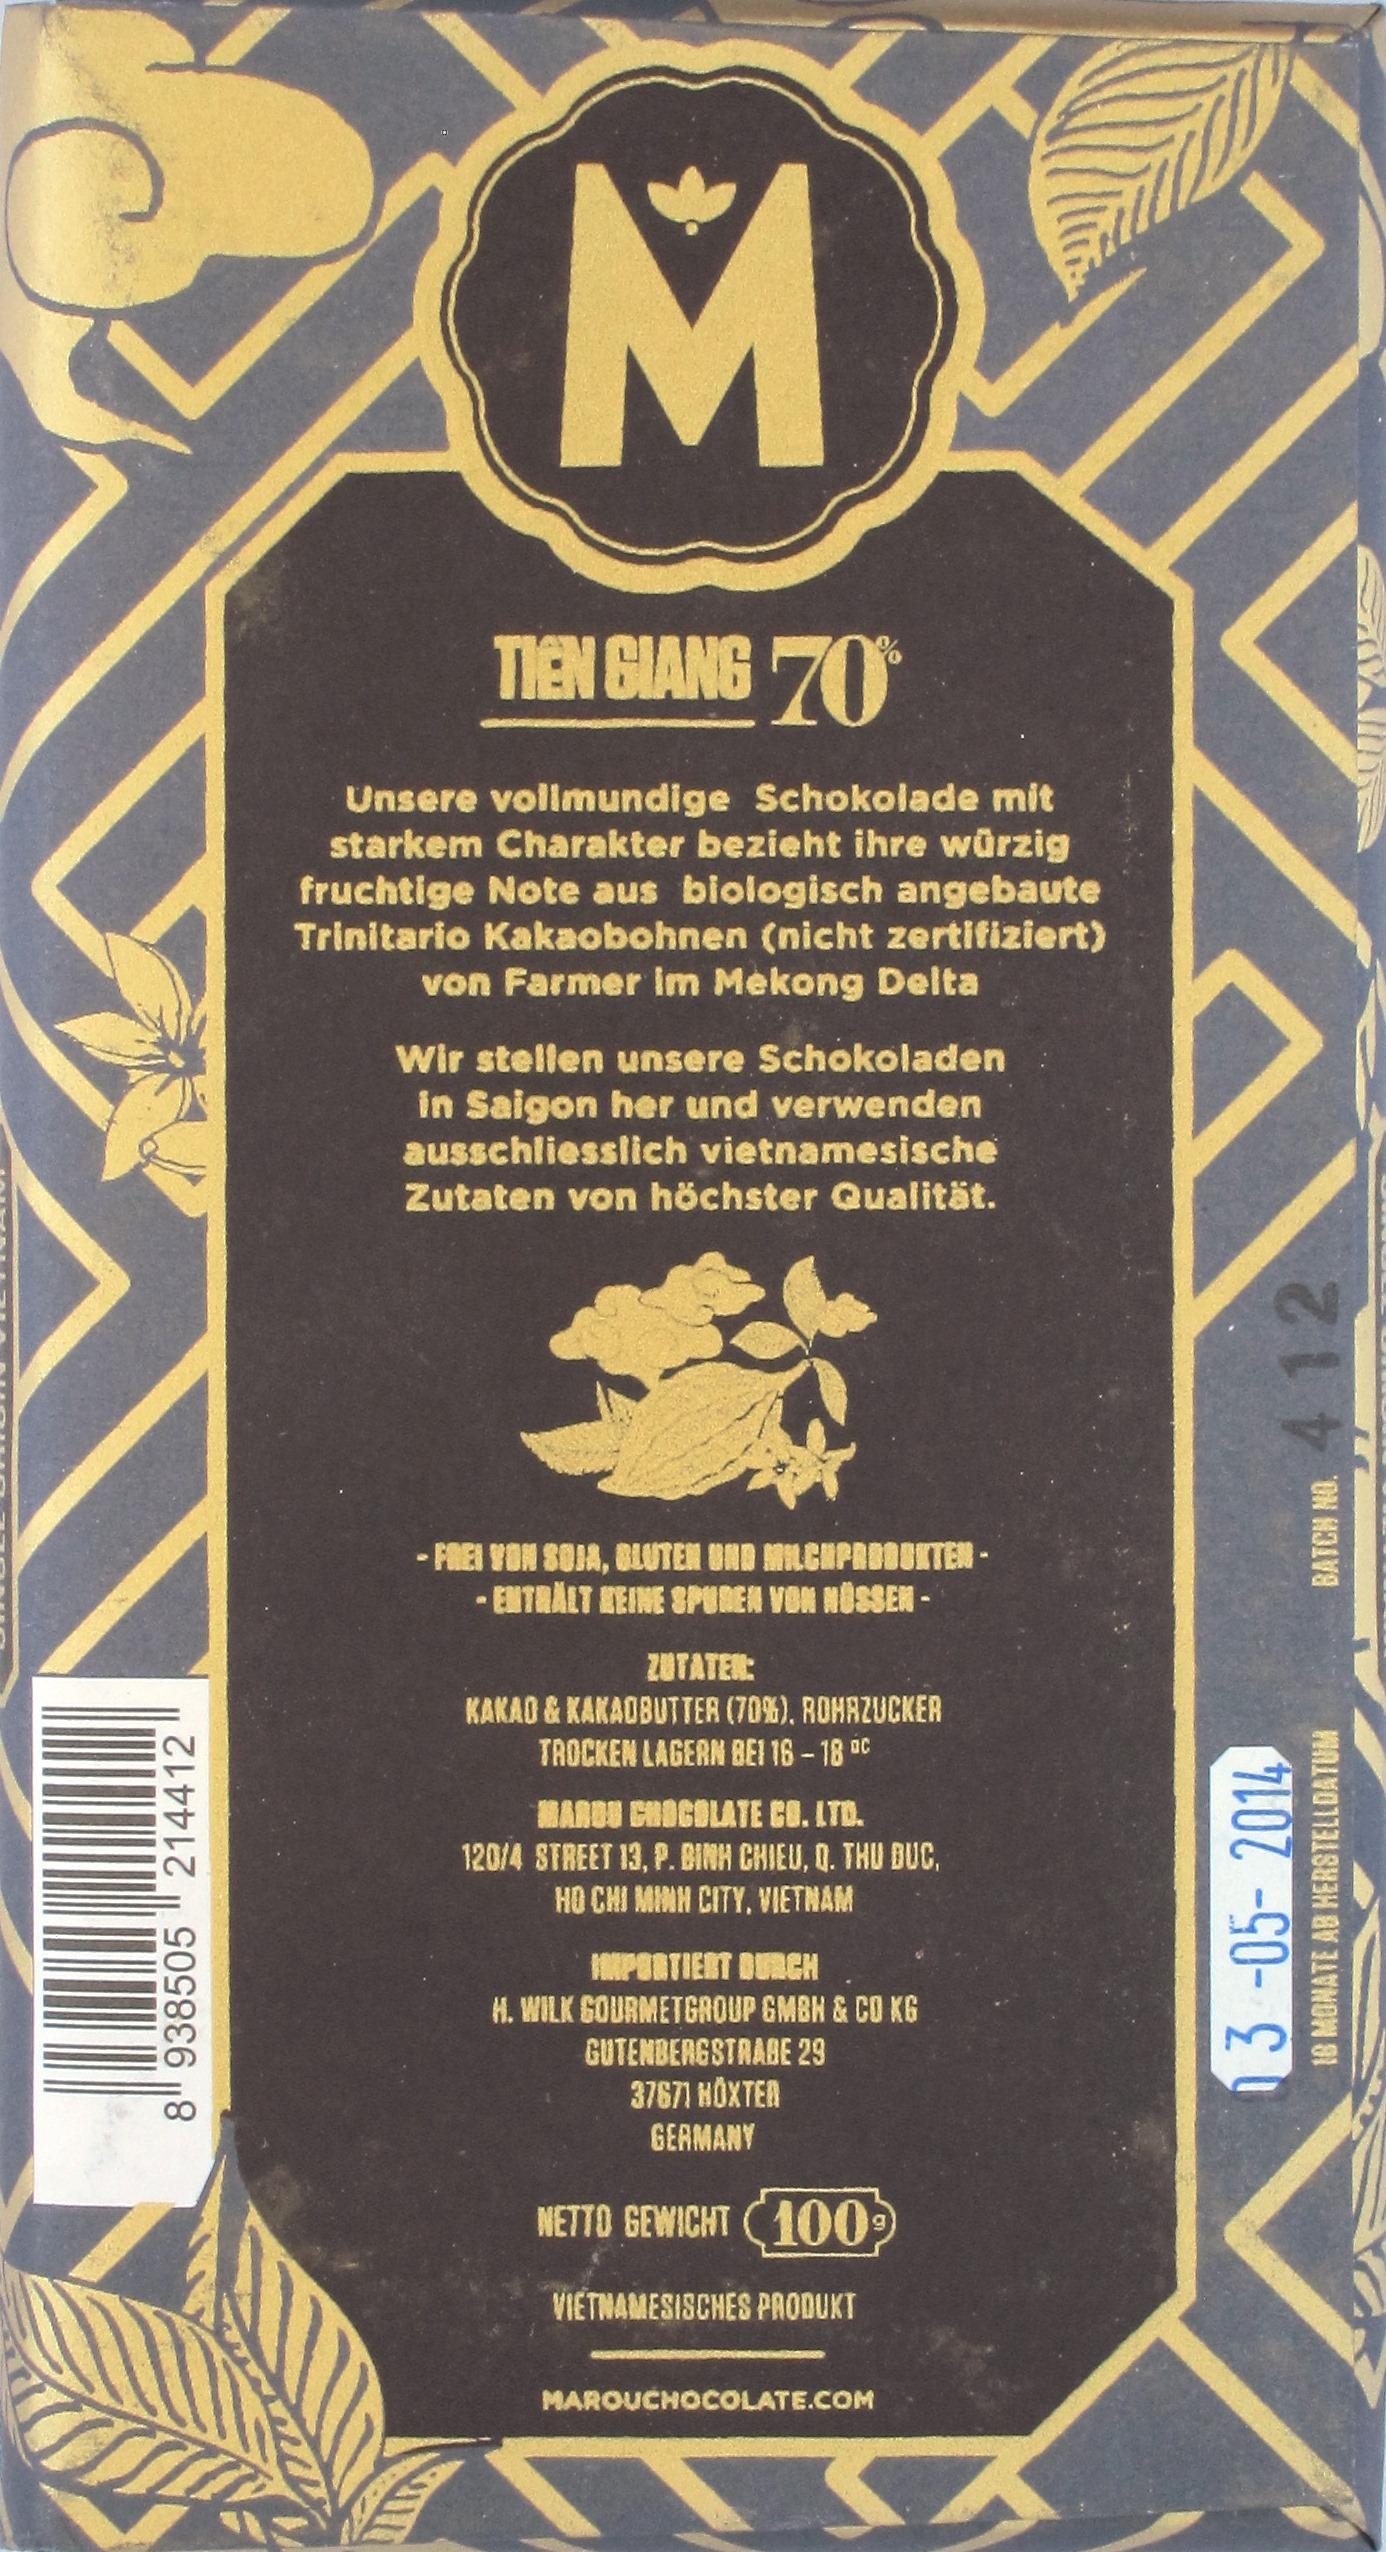 Vietnam-Schokolade Marou Tien Giang, 70%: Rückseite